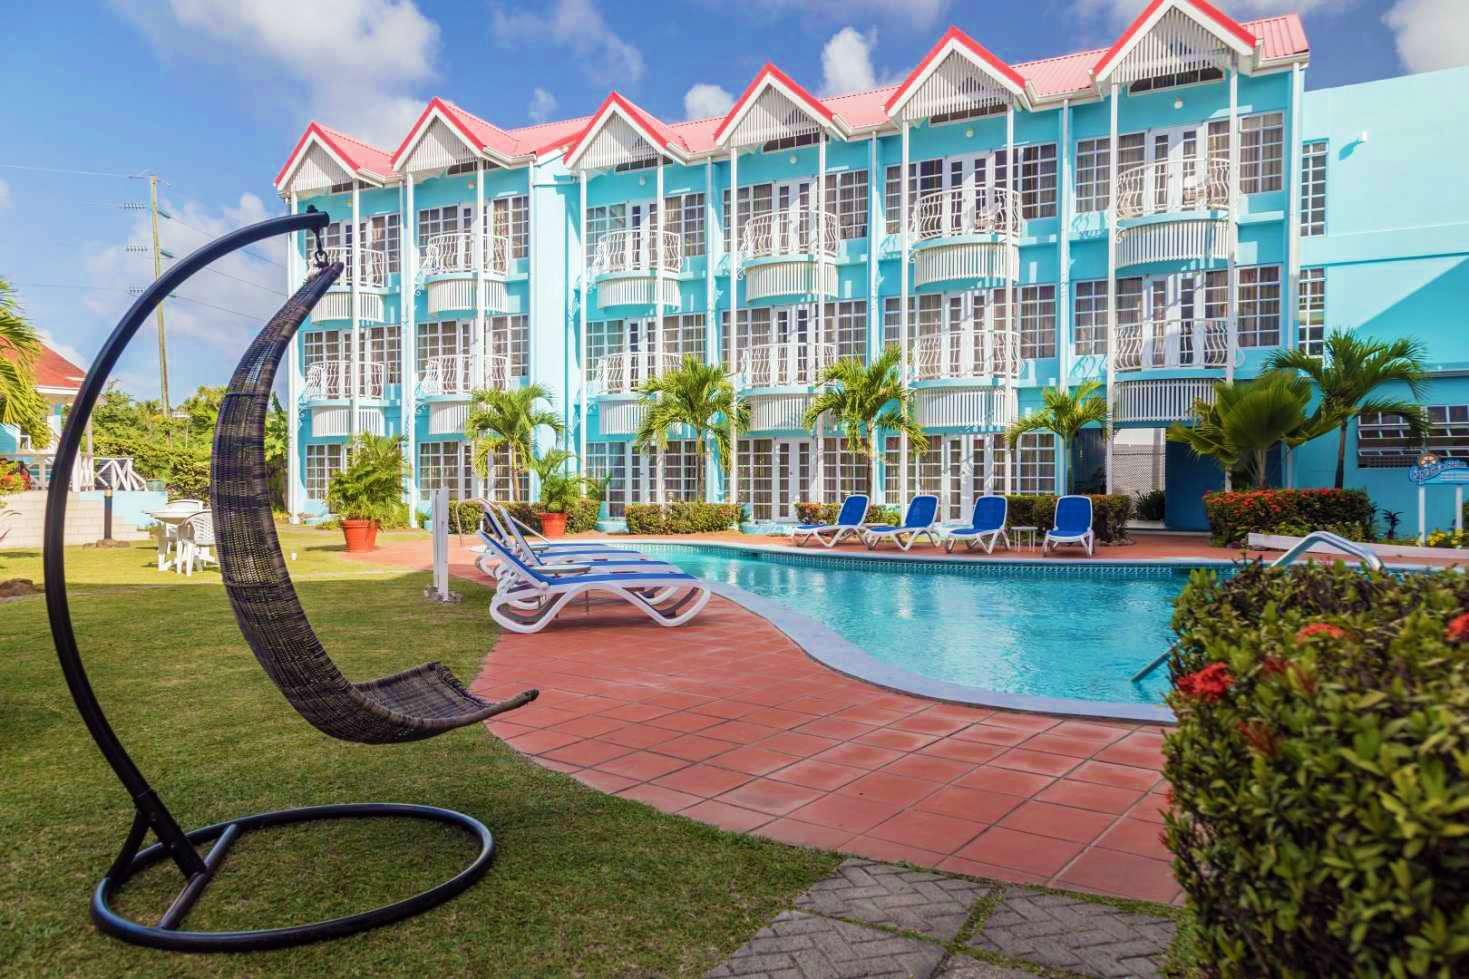 Bay Gardens Marina Haven, Gros Islet, St Lucia